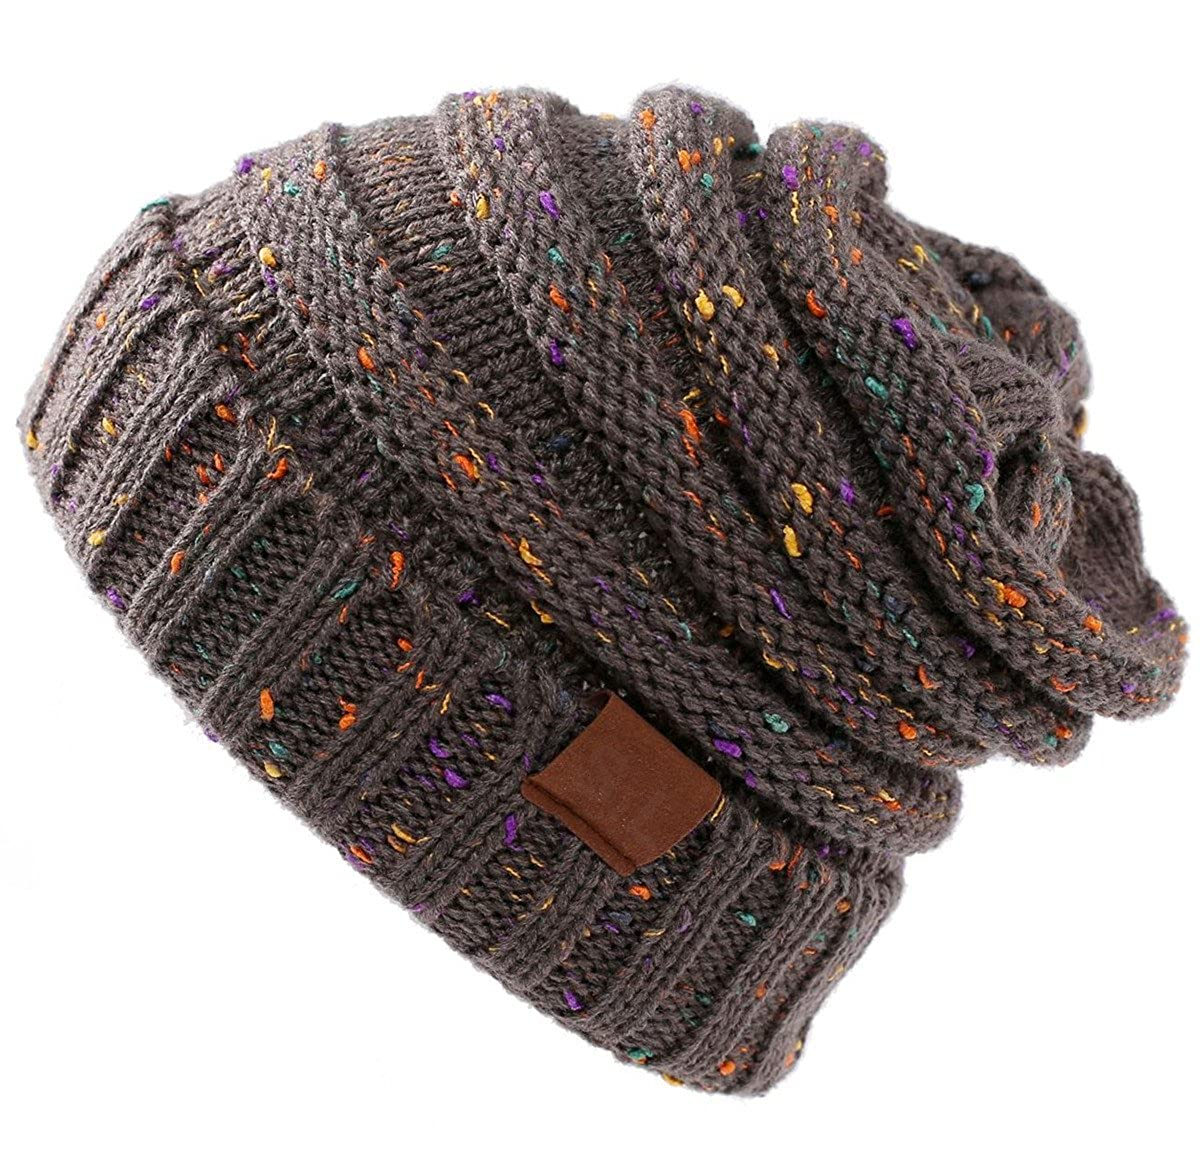 SEALEN Cotton Confetti Exclusive Oversized Baggy Slouchy Thick Hat ... b3bfabc6da6c8